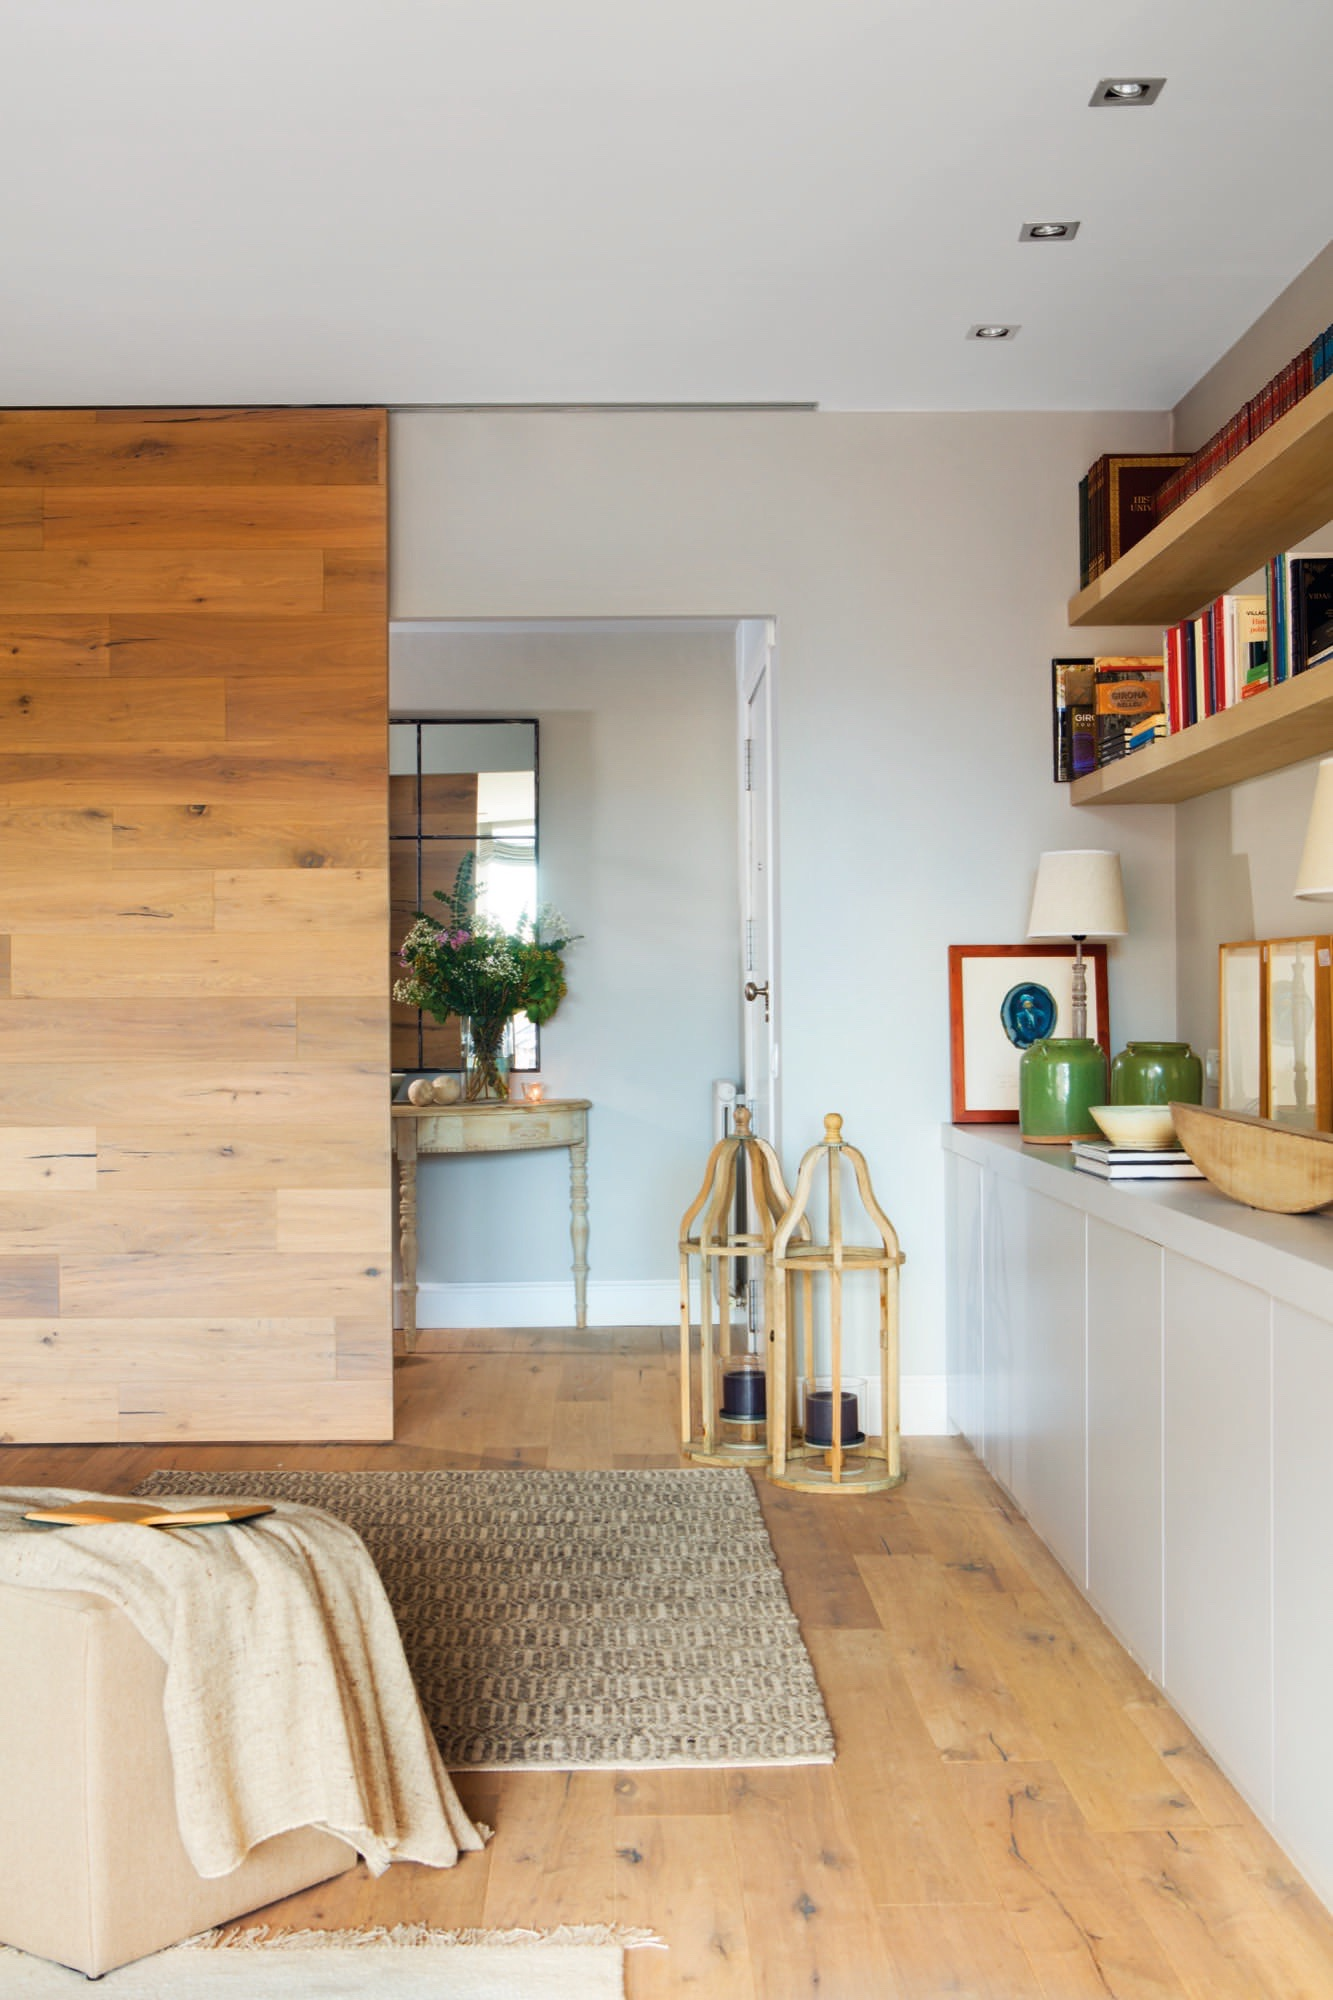 Puertas correderas de cristal de madera o empotradas for Puertas de habitaciones modernas